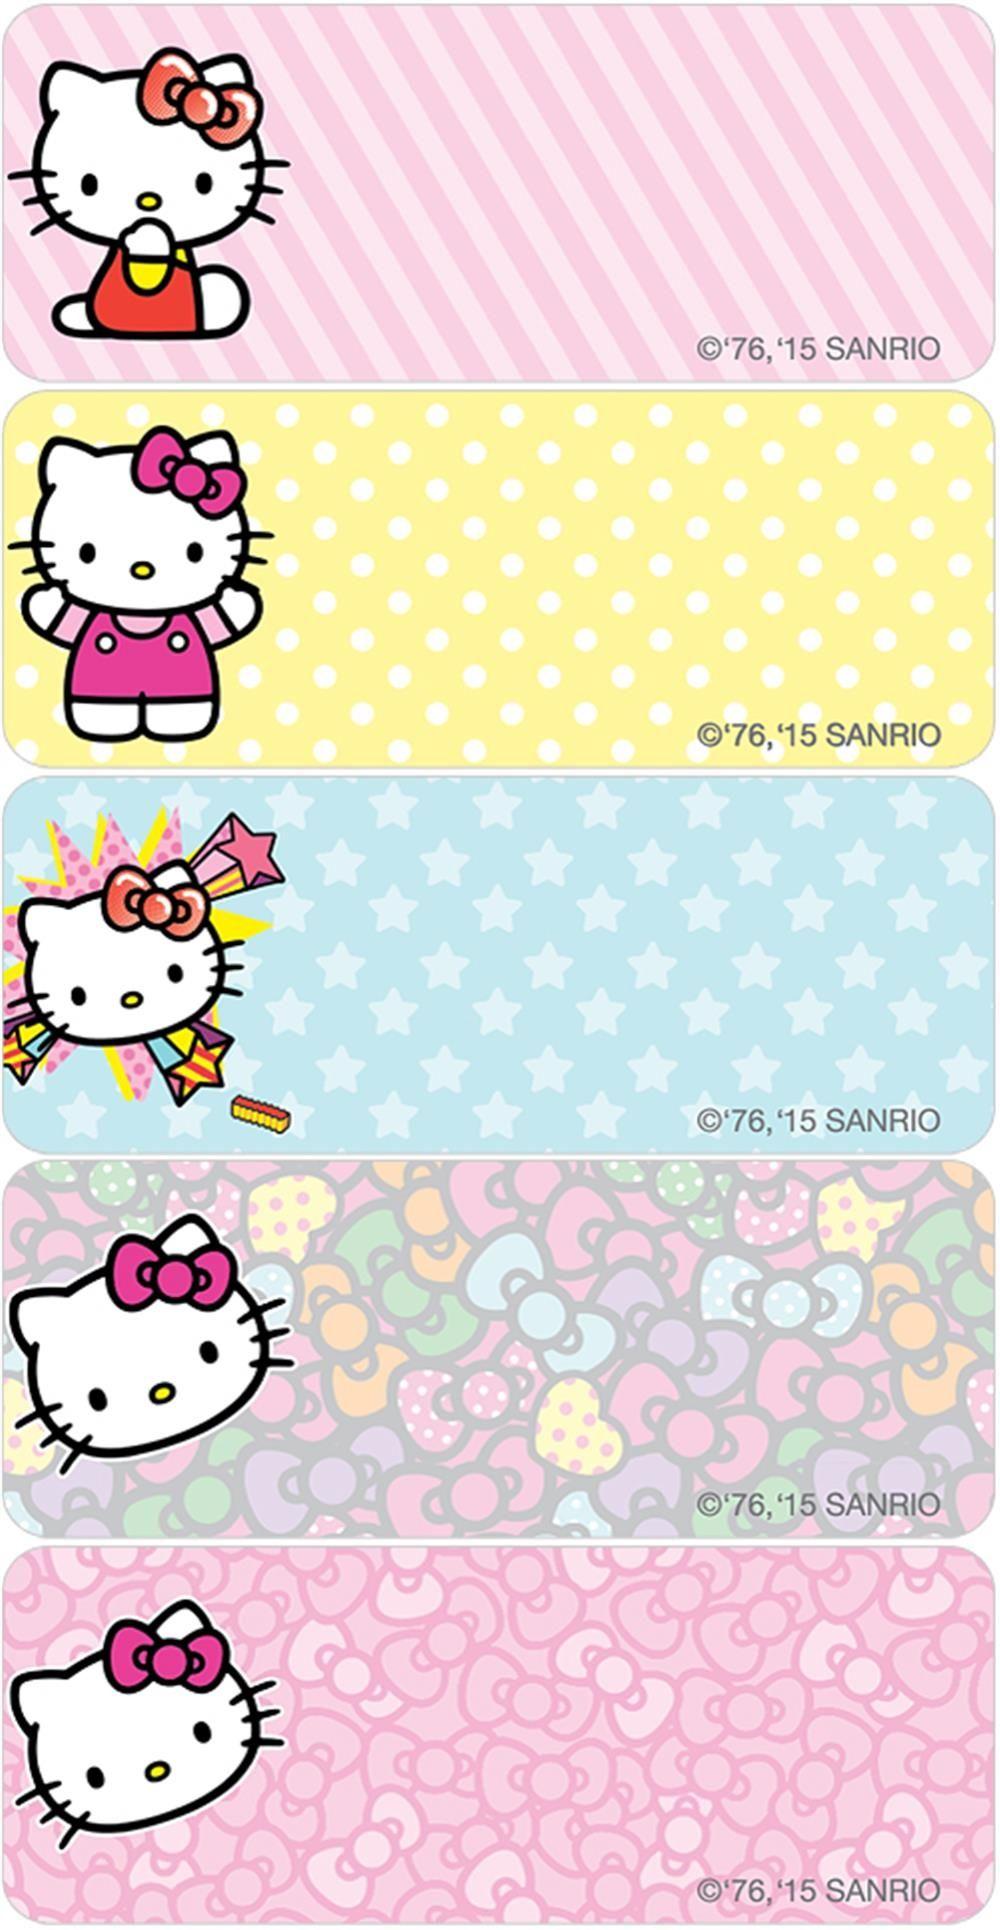 Hello Kittya Pop Address Labels Rl 588c Costco Check Printing Hello Kitty Printables Hello Kitty Hello Kitty Images